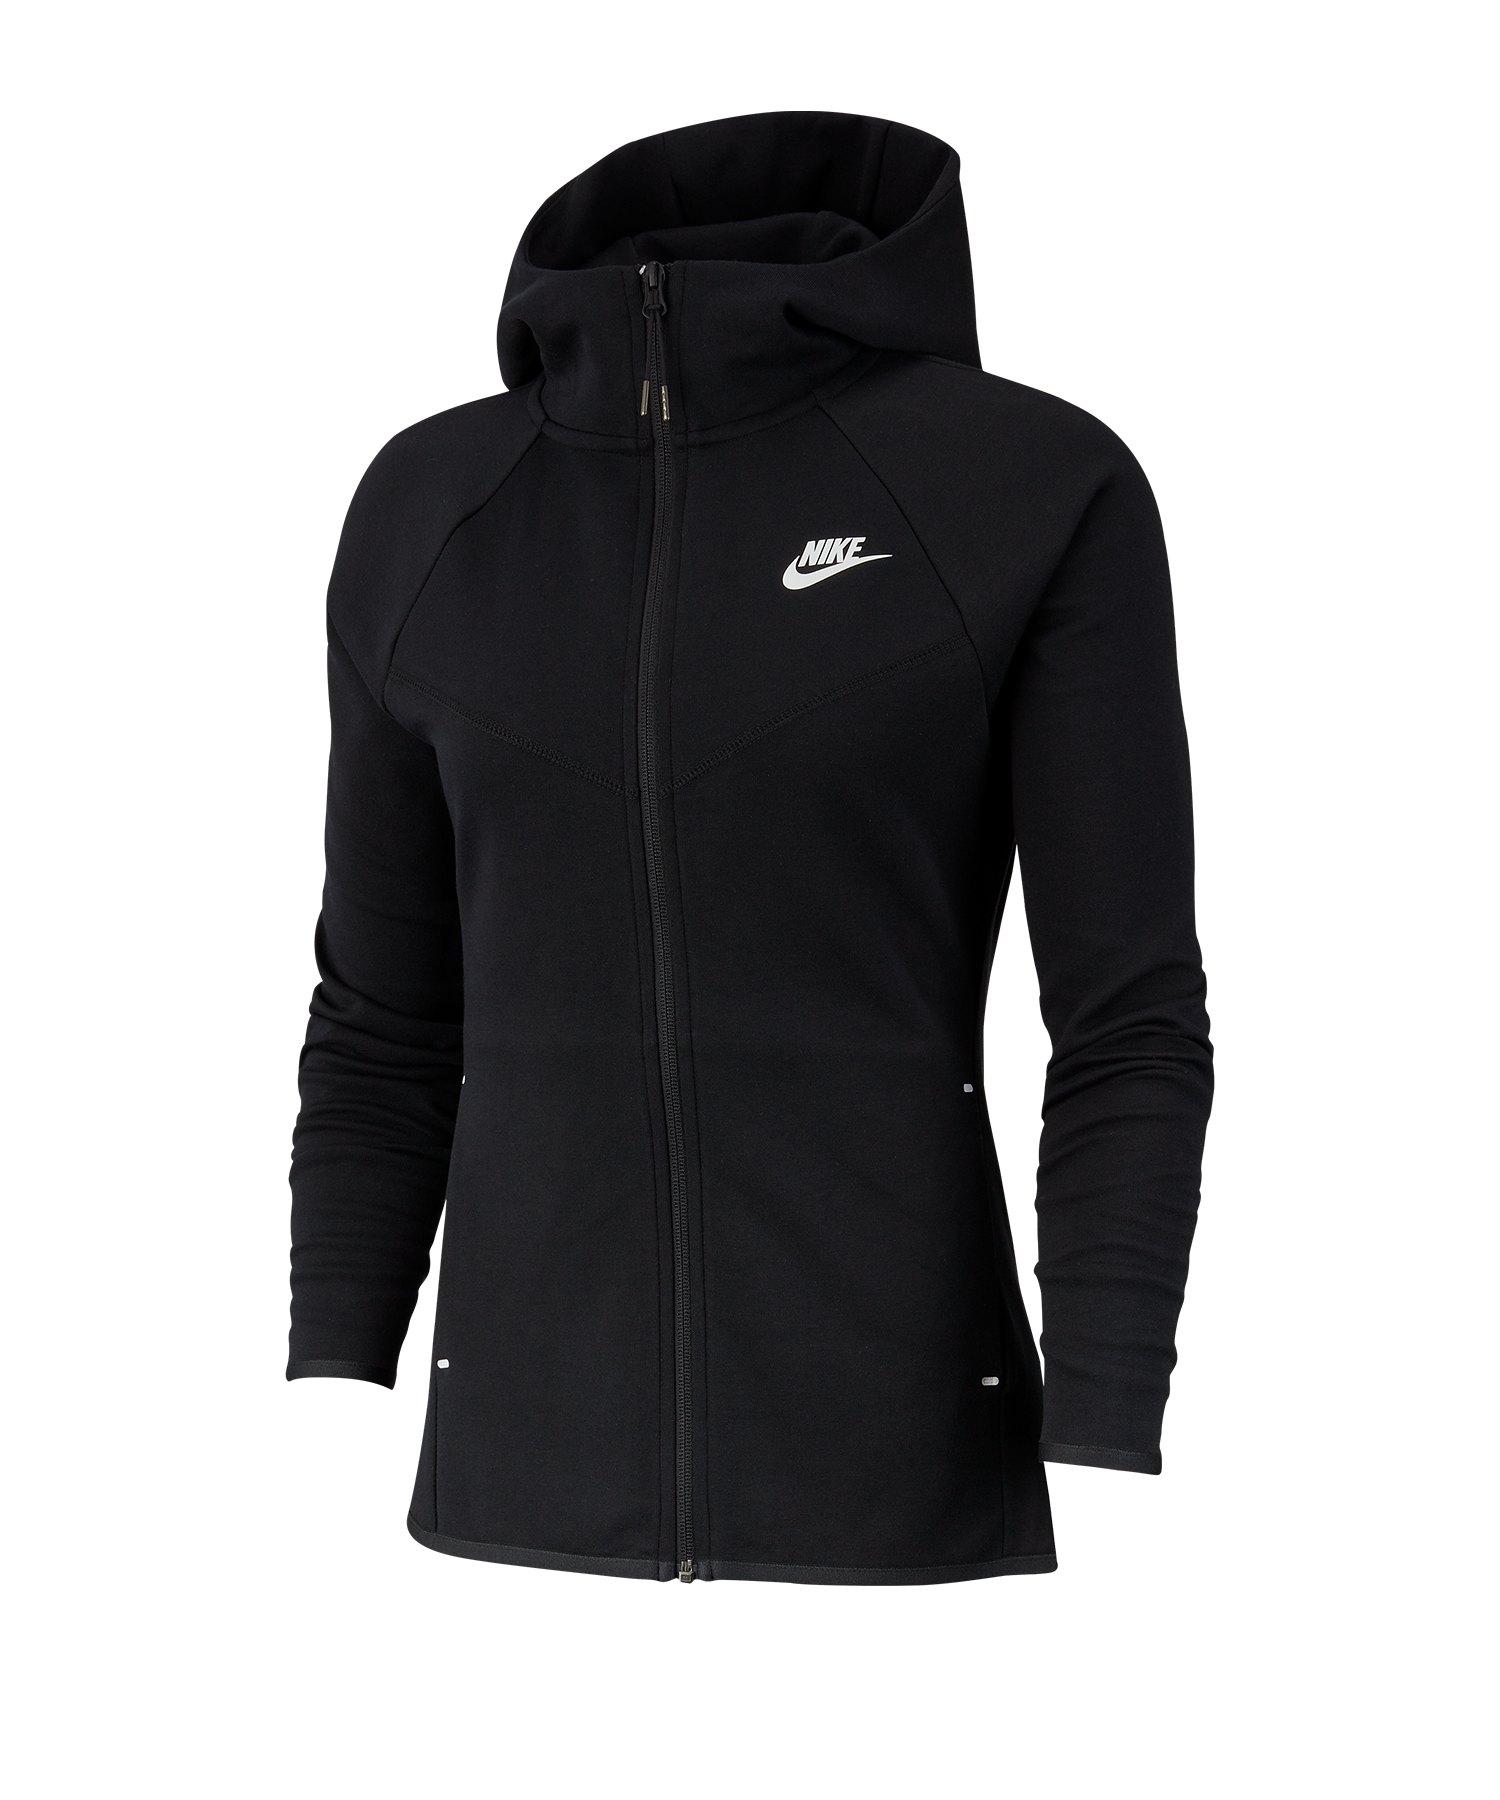 Nike Tech Fleece Kapuzenjacke Damen Schwarz F010 - schwarz